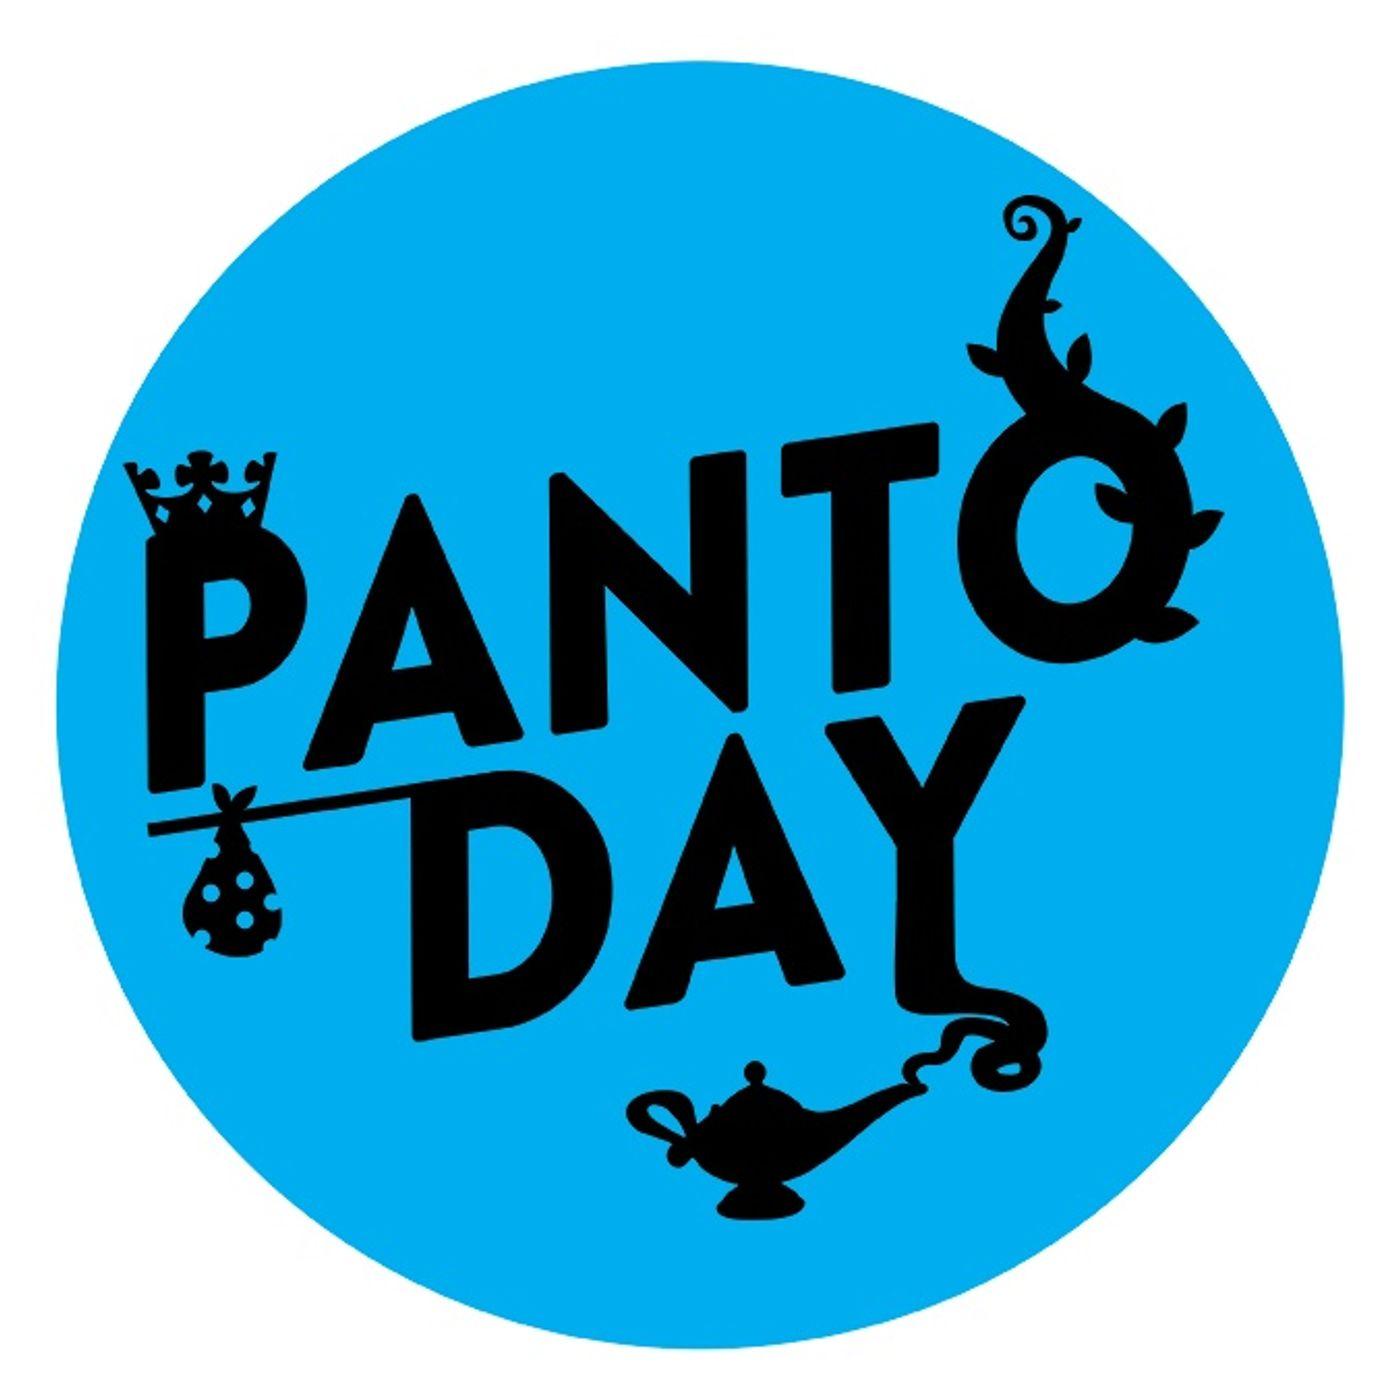 Celebrate Panto